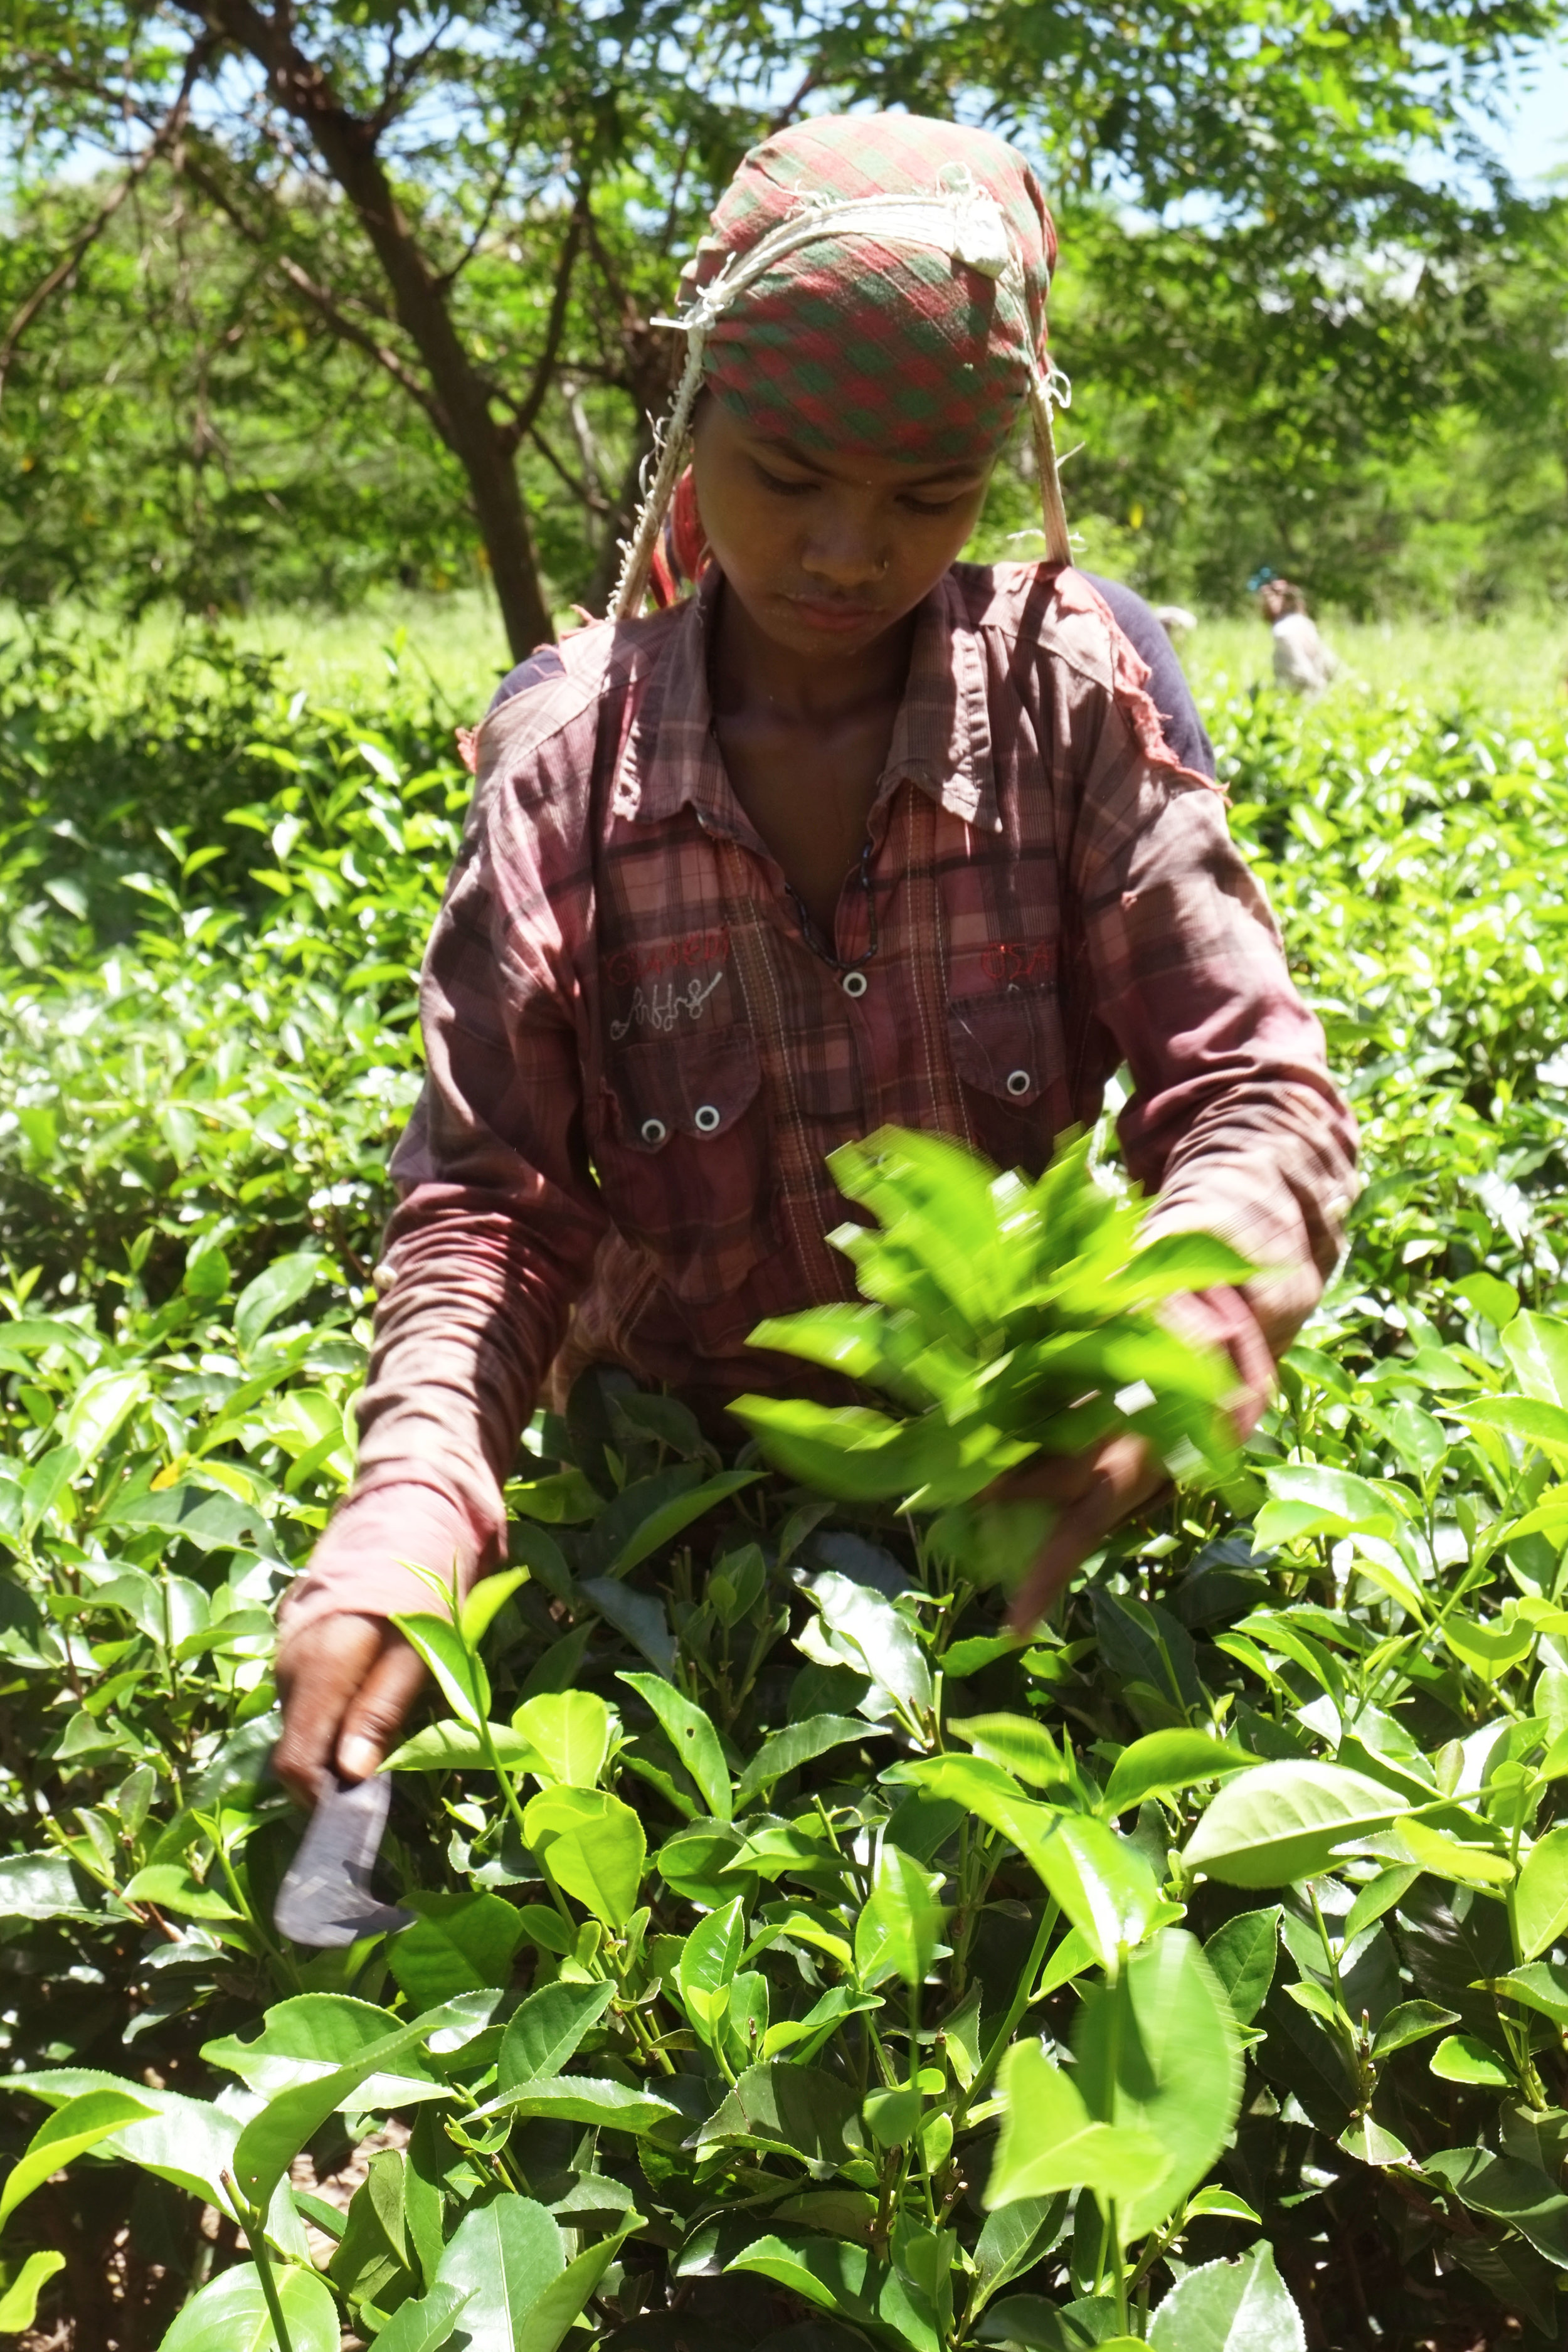 Lesly Lotha_Tea Garden_Assam_India_2016 - 06